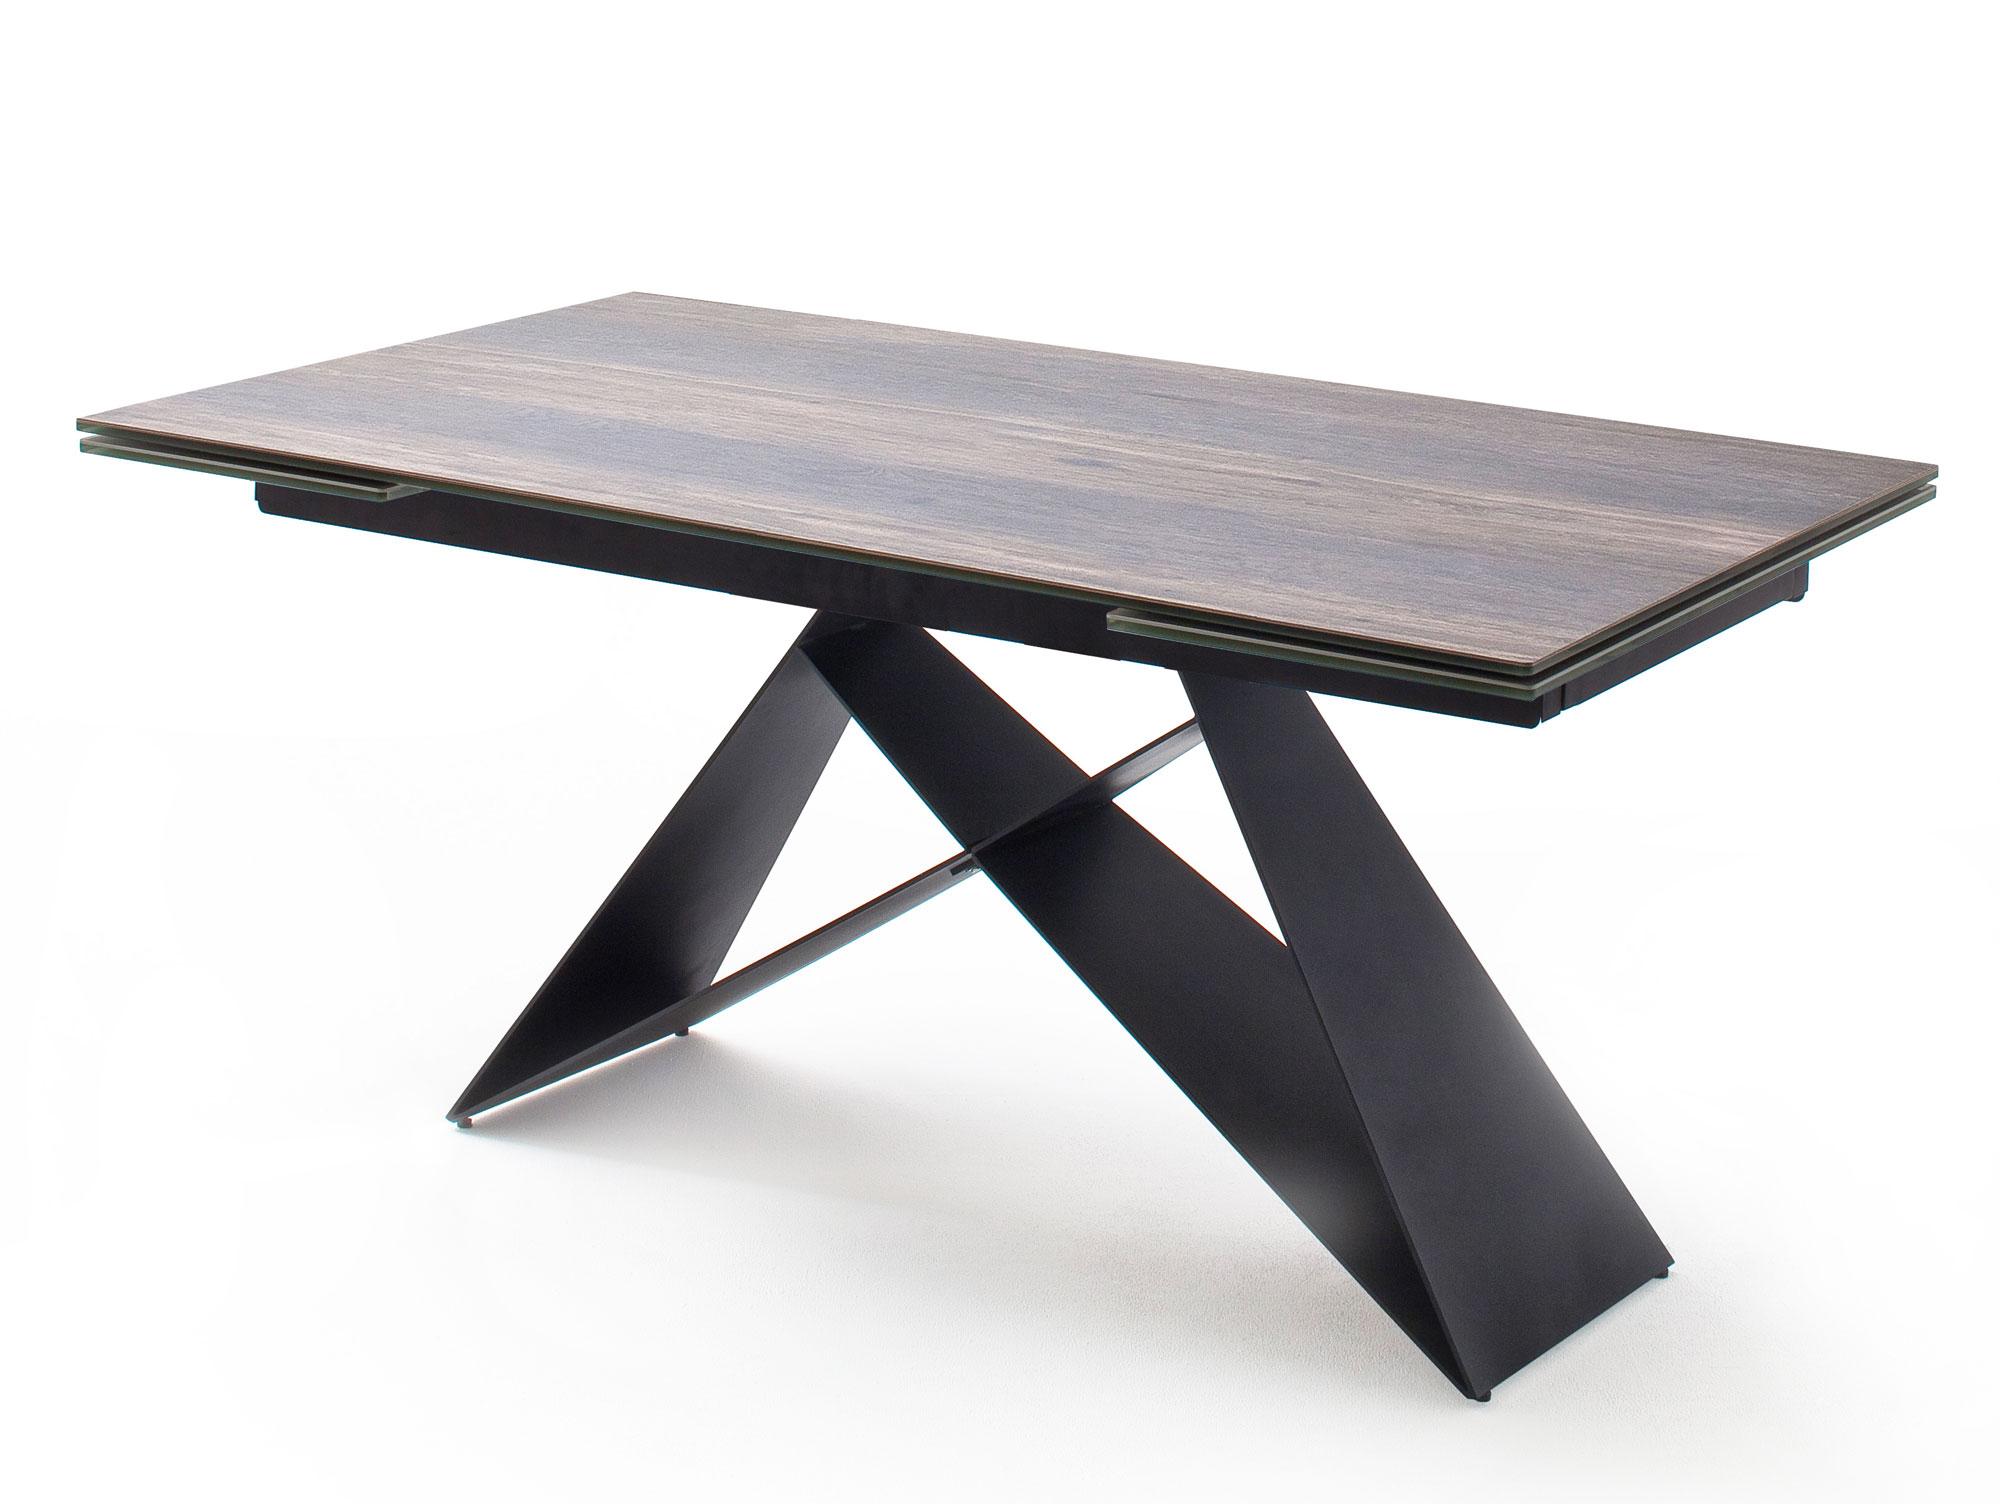 KAJAN Esstisch 35/35x35 cm, Material Glas/Metall, holzfarbig